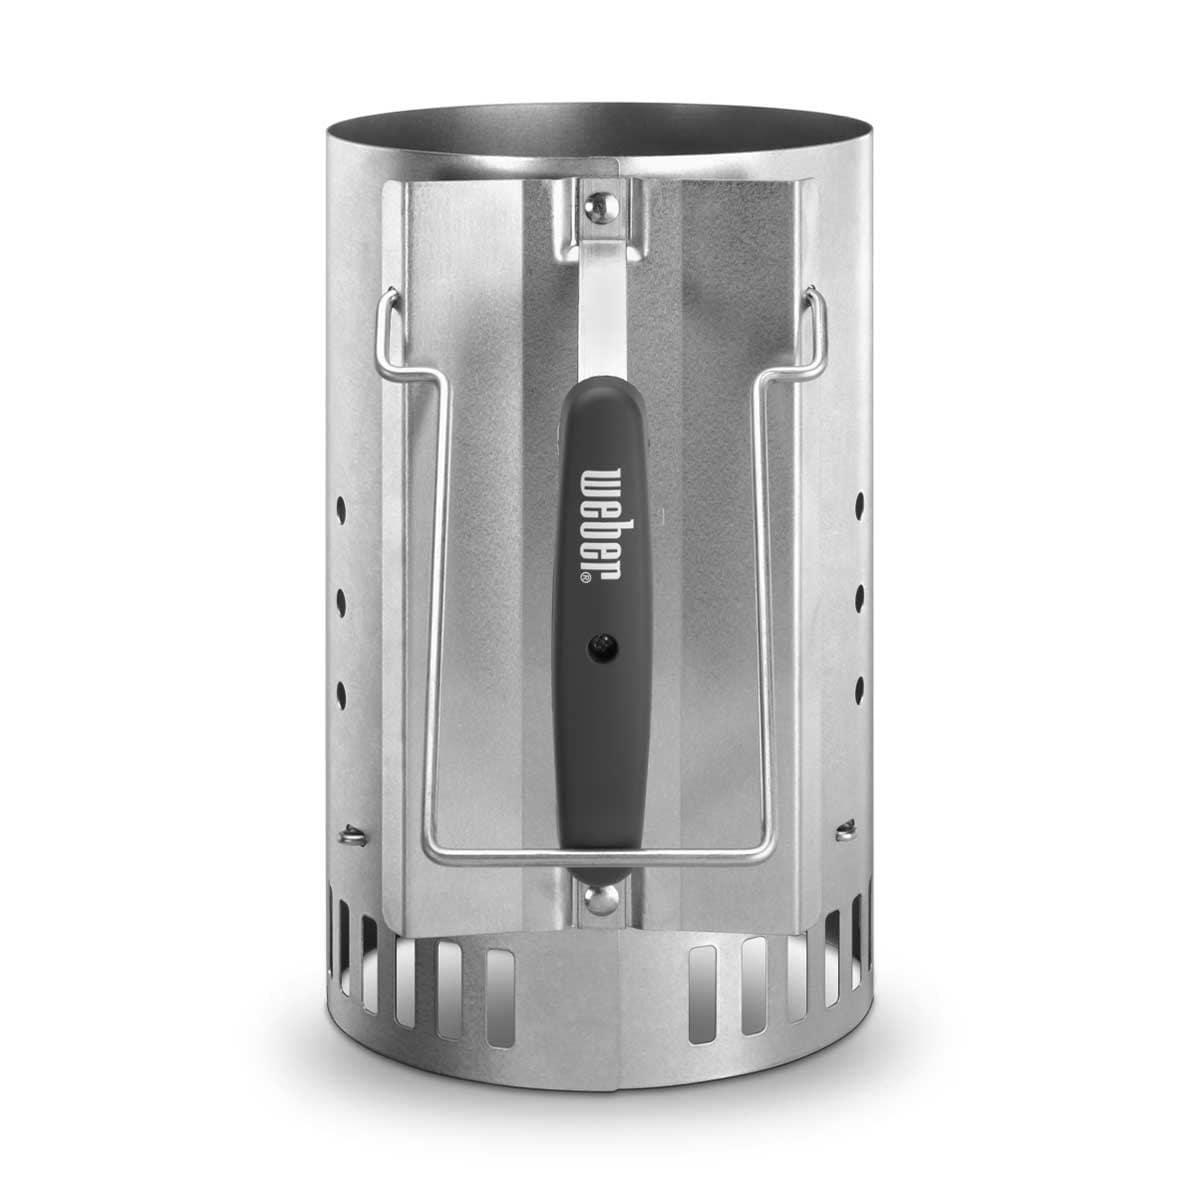 Chimenea Encendedor de Carbon Weber Mod 7416